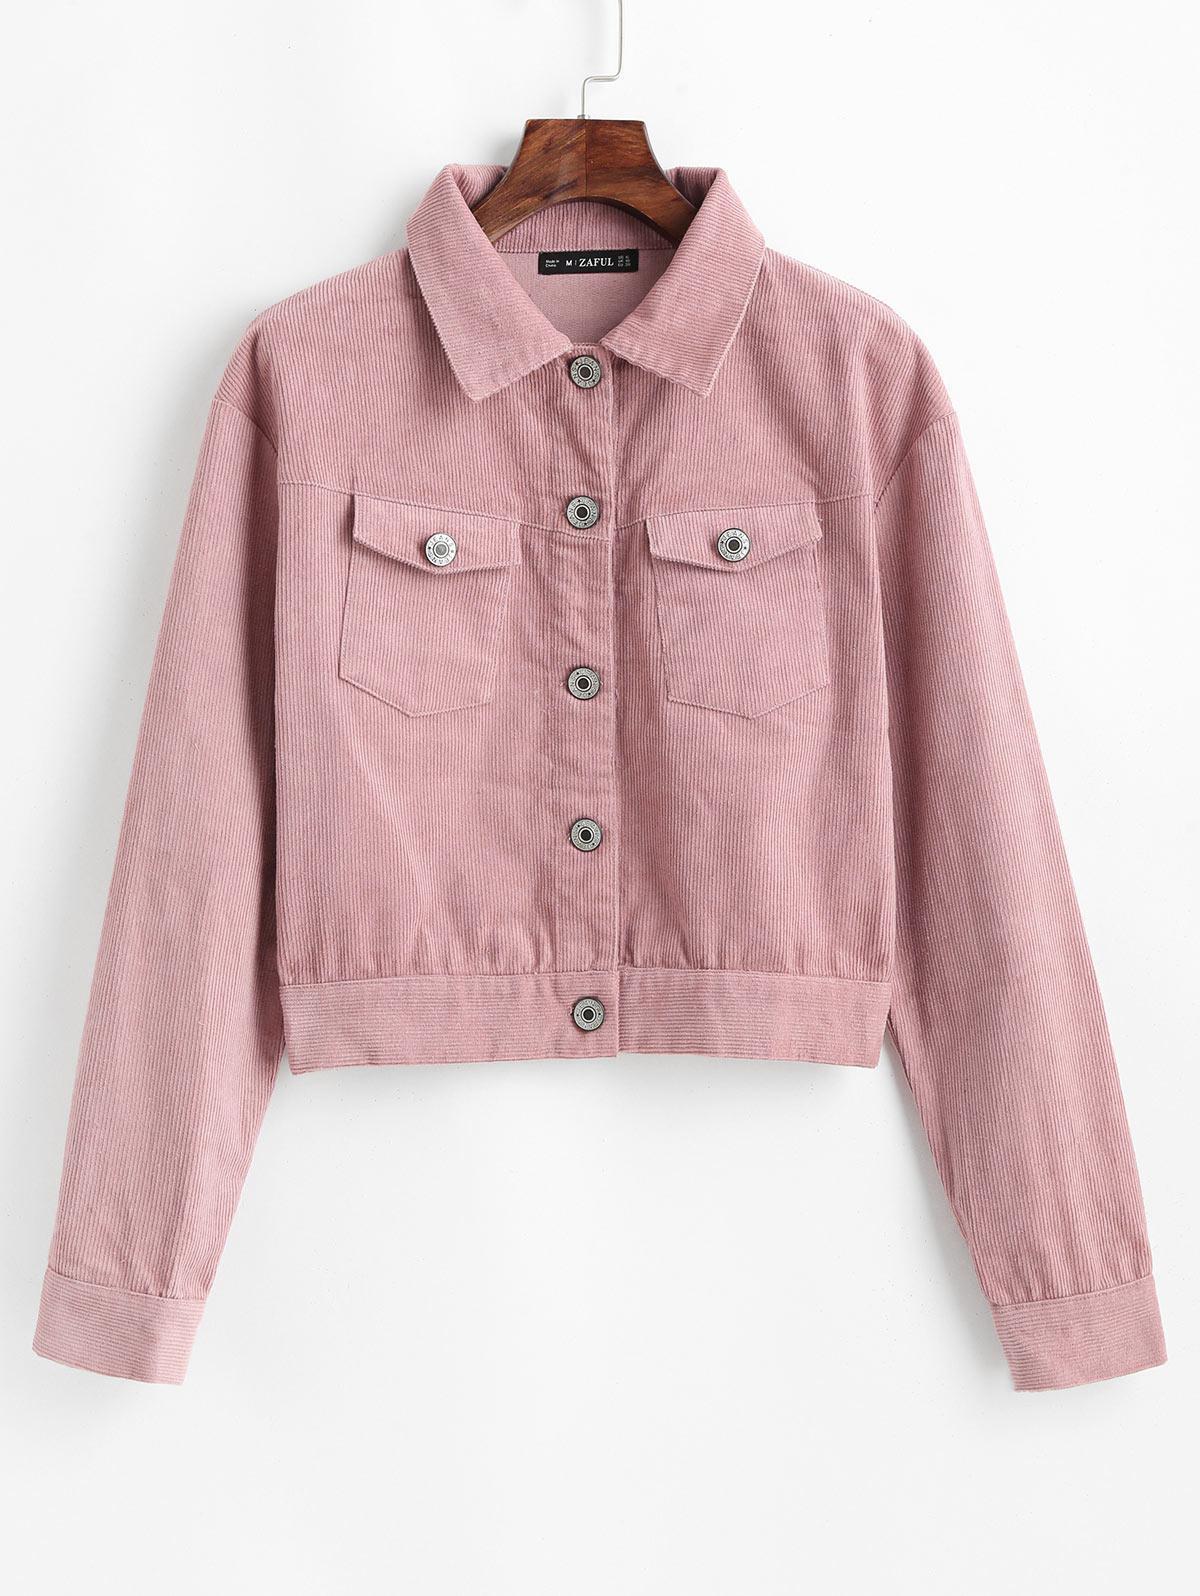 ZAFUL Button Up Cropped Corduroy Jacket